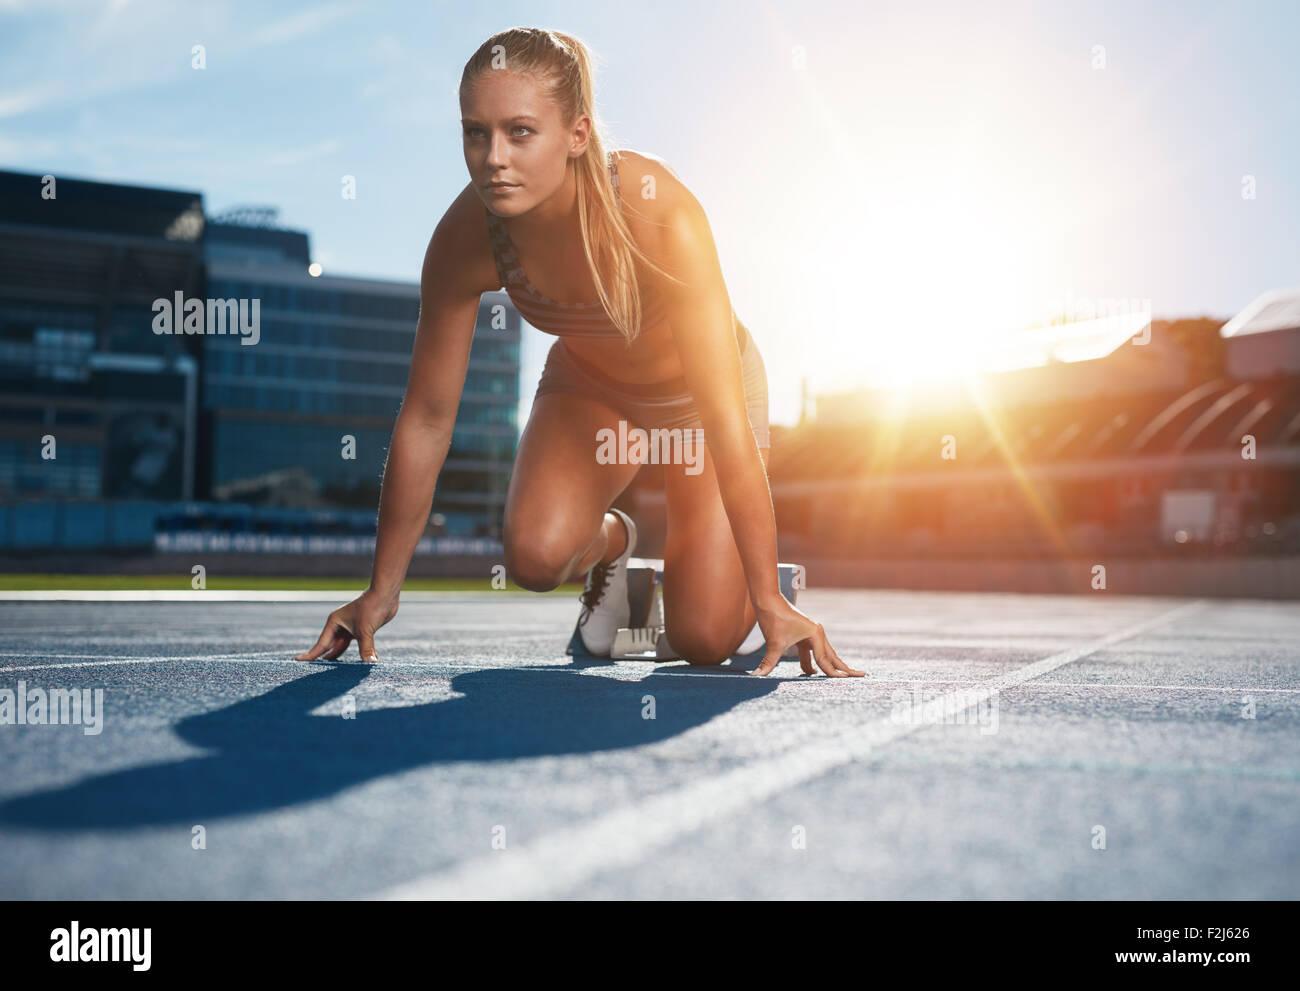 Montar y seguros de mujer en posición inicial listo para ejecutar. Atleta Femenina a punto de empezar un sprint Imagen De Stock